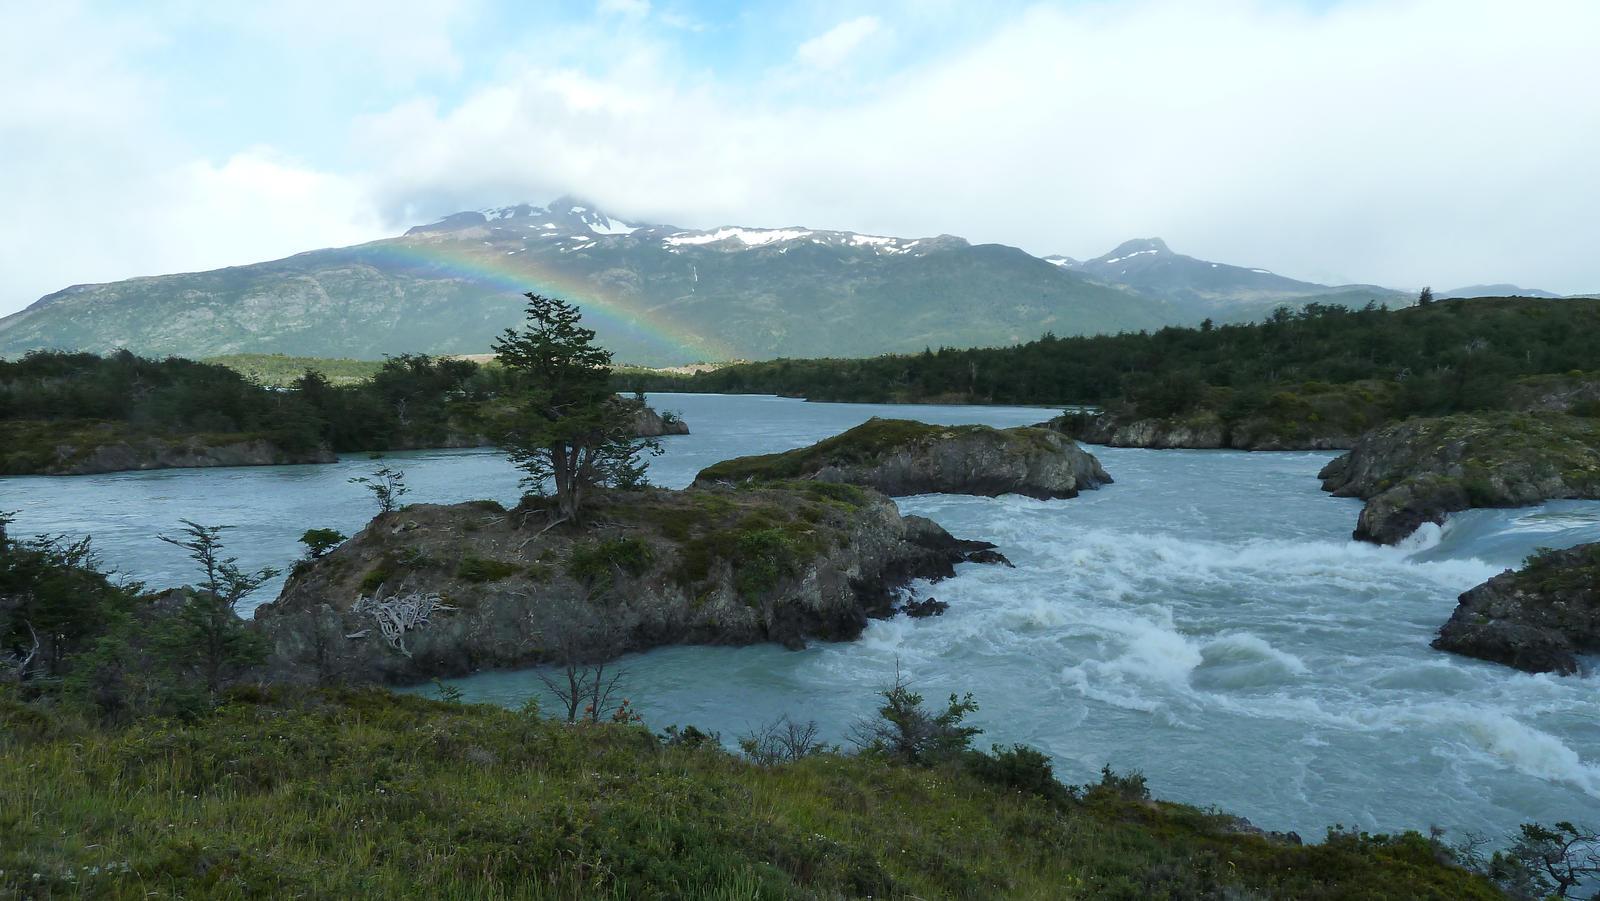 Patagonian River 03 by fuguestock